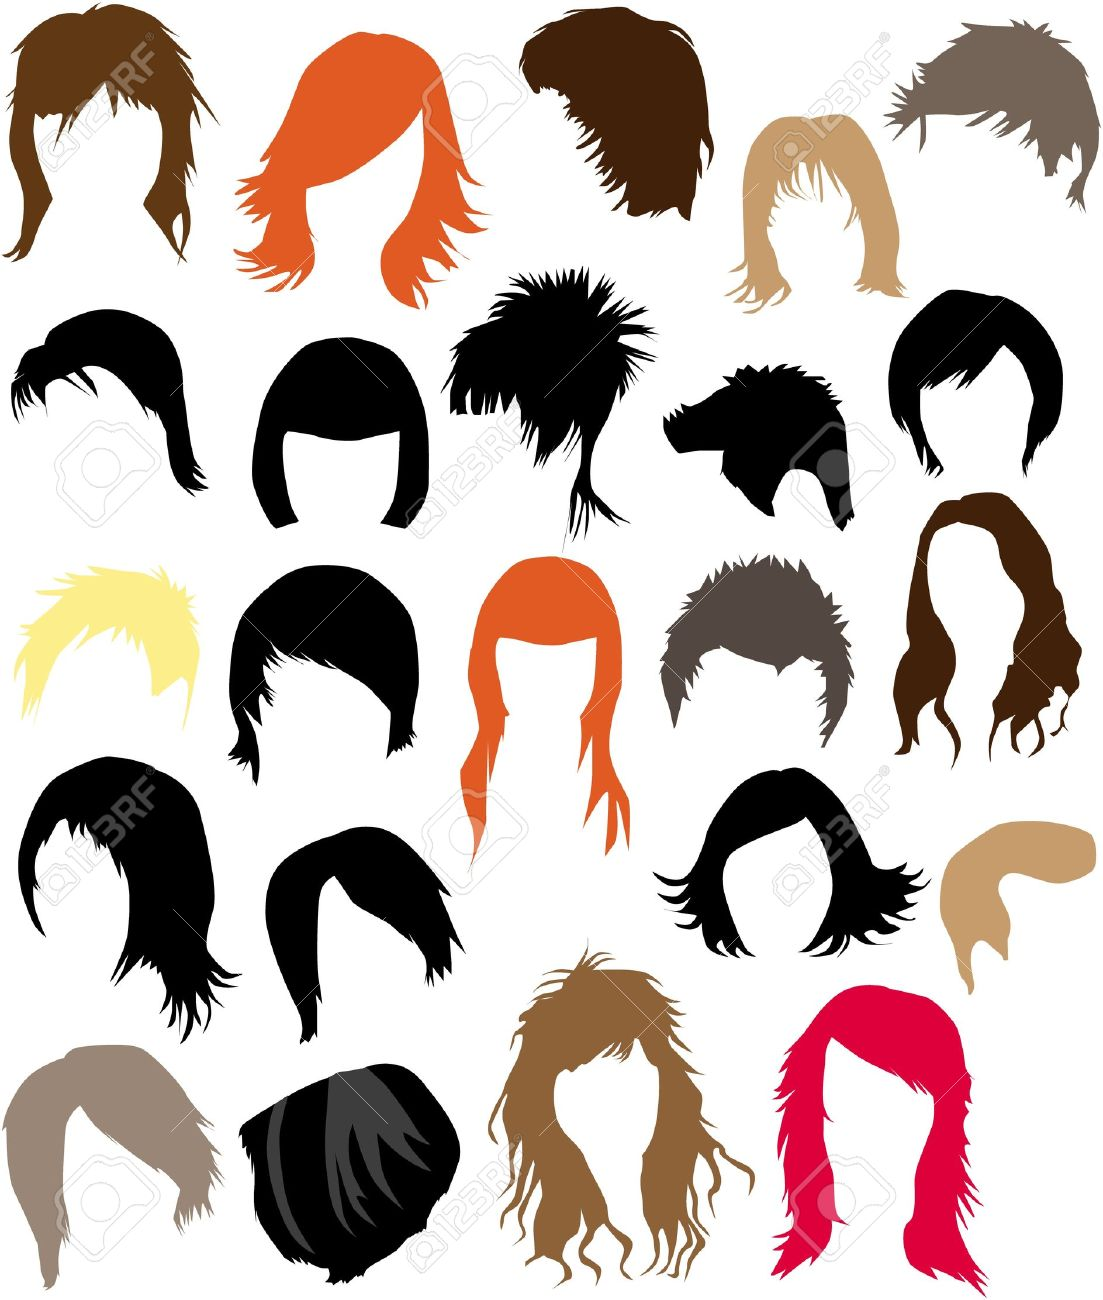 1103x1300 Hair Clipart Man Vector